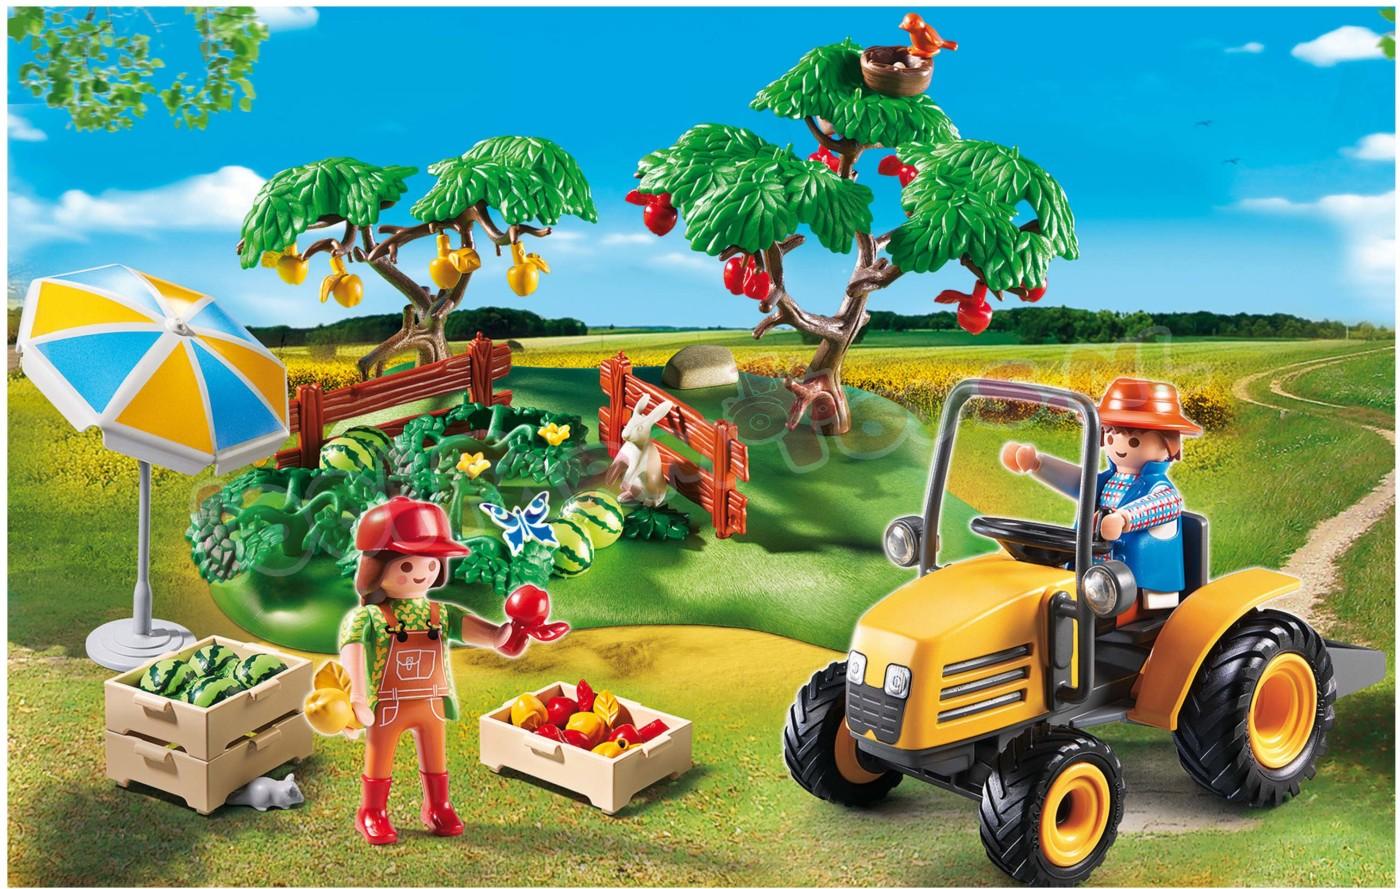 Playmobil starterset boomgaarden 6870 uitverkocht farm - Betonniere playmobil ...